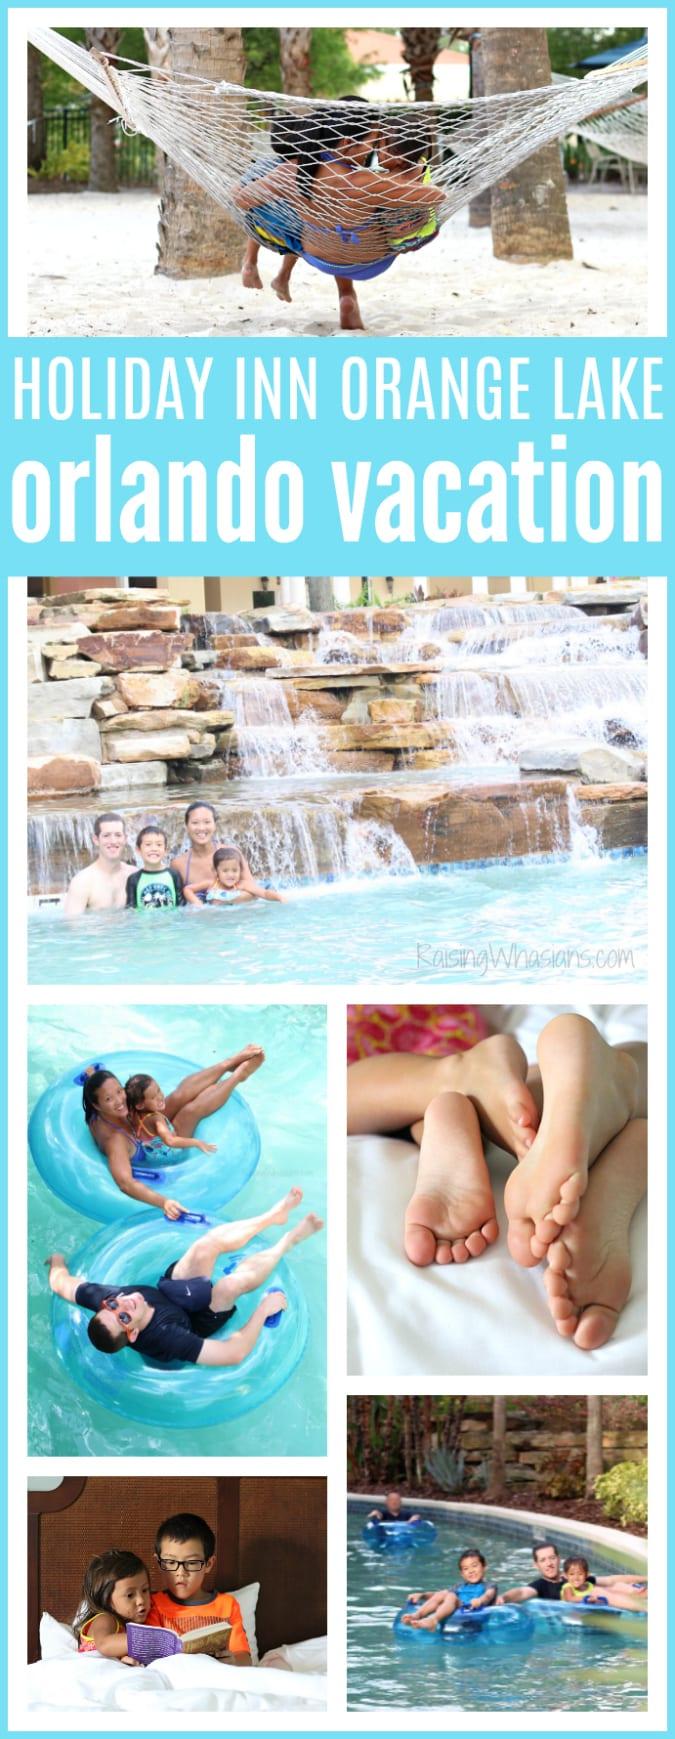 Orlando vacation holiday inn orange lake